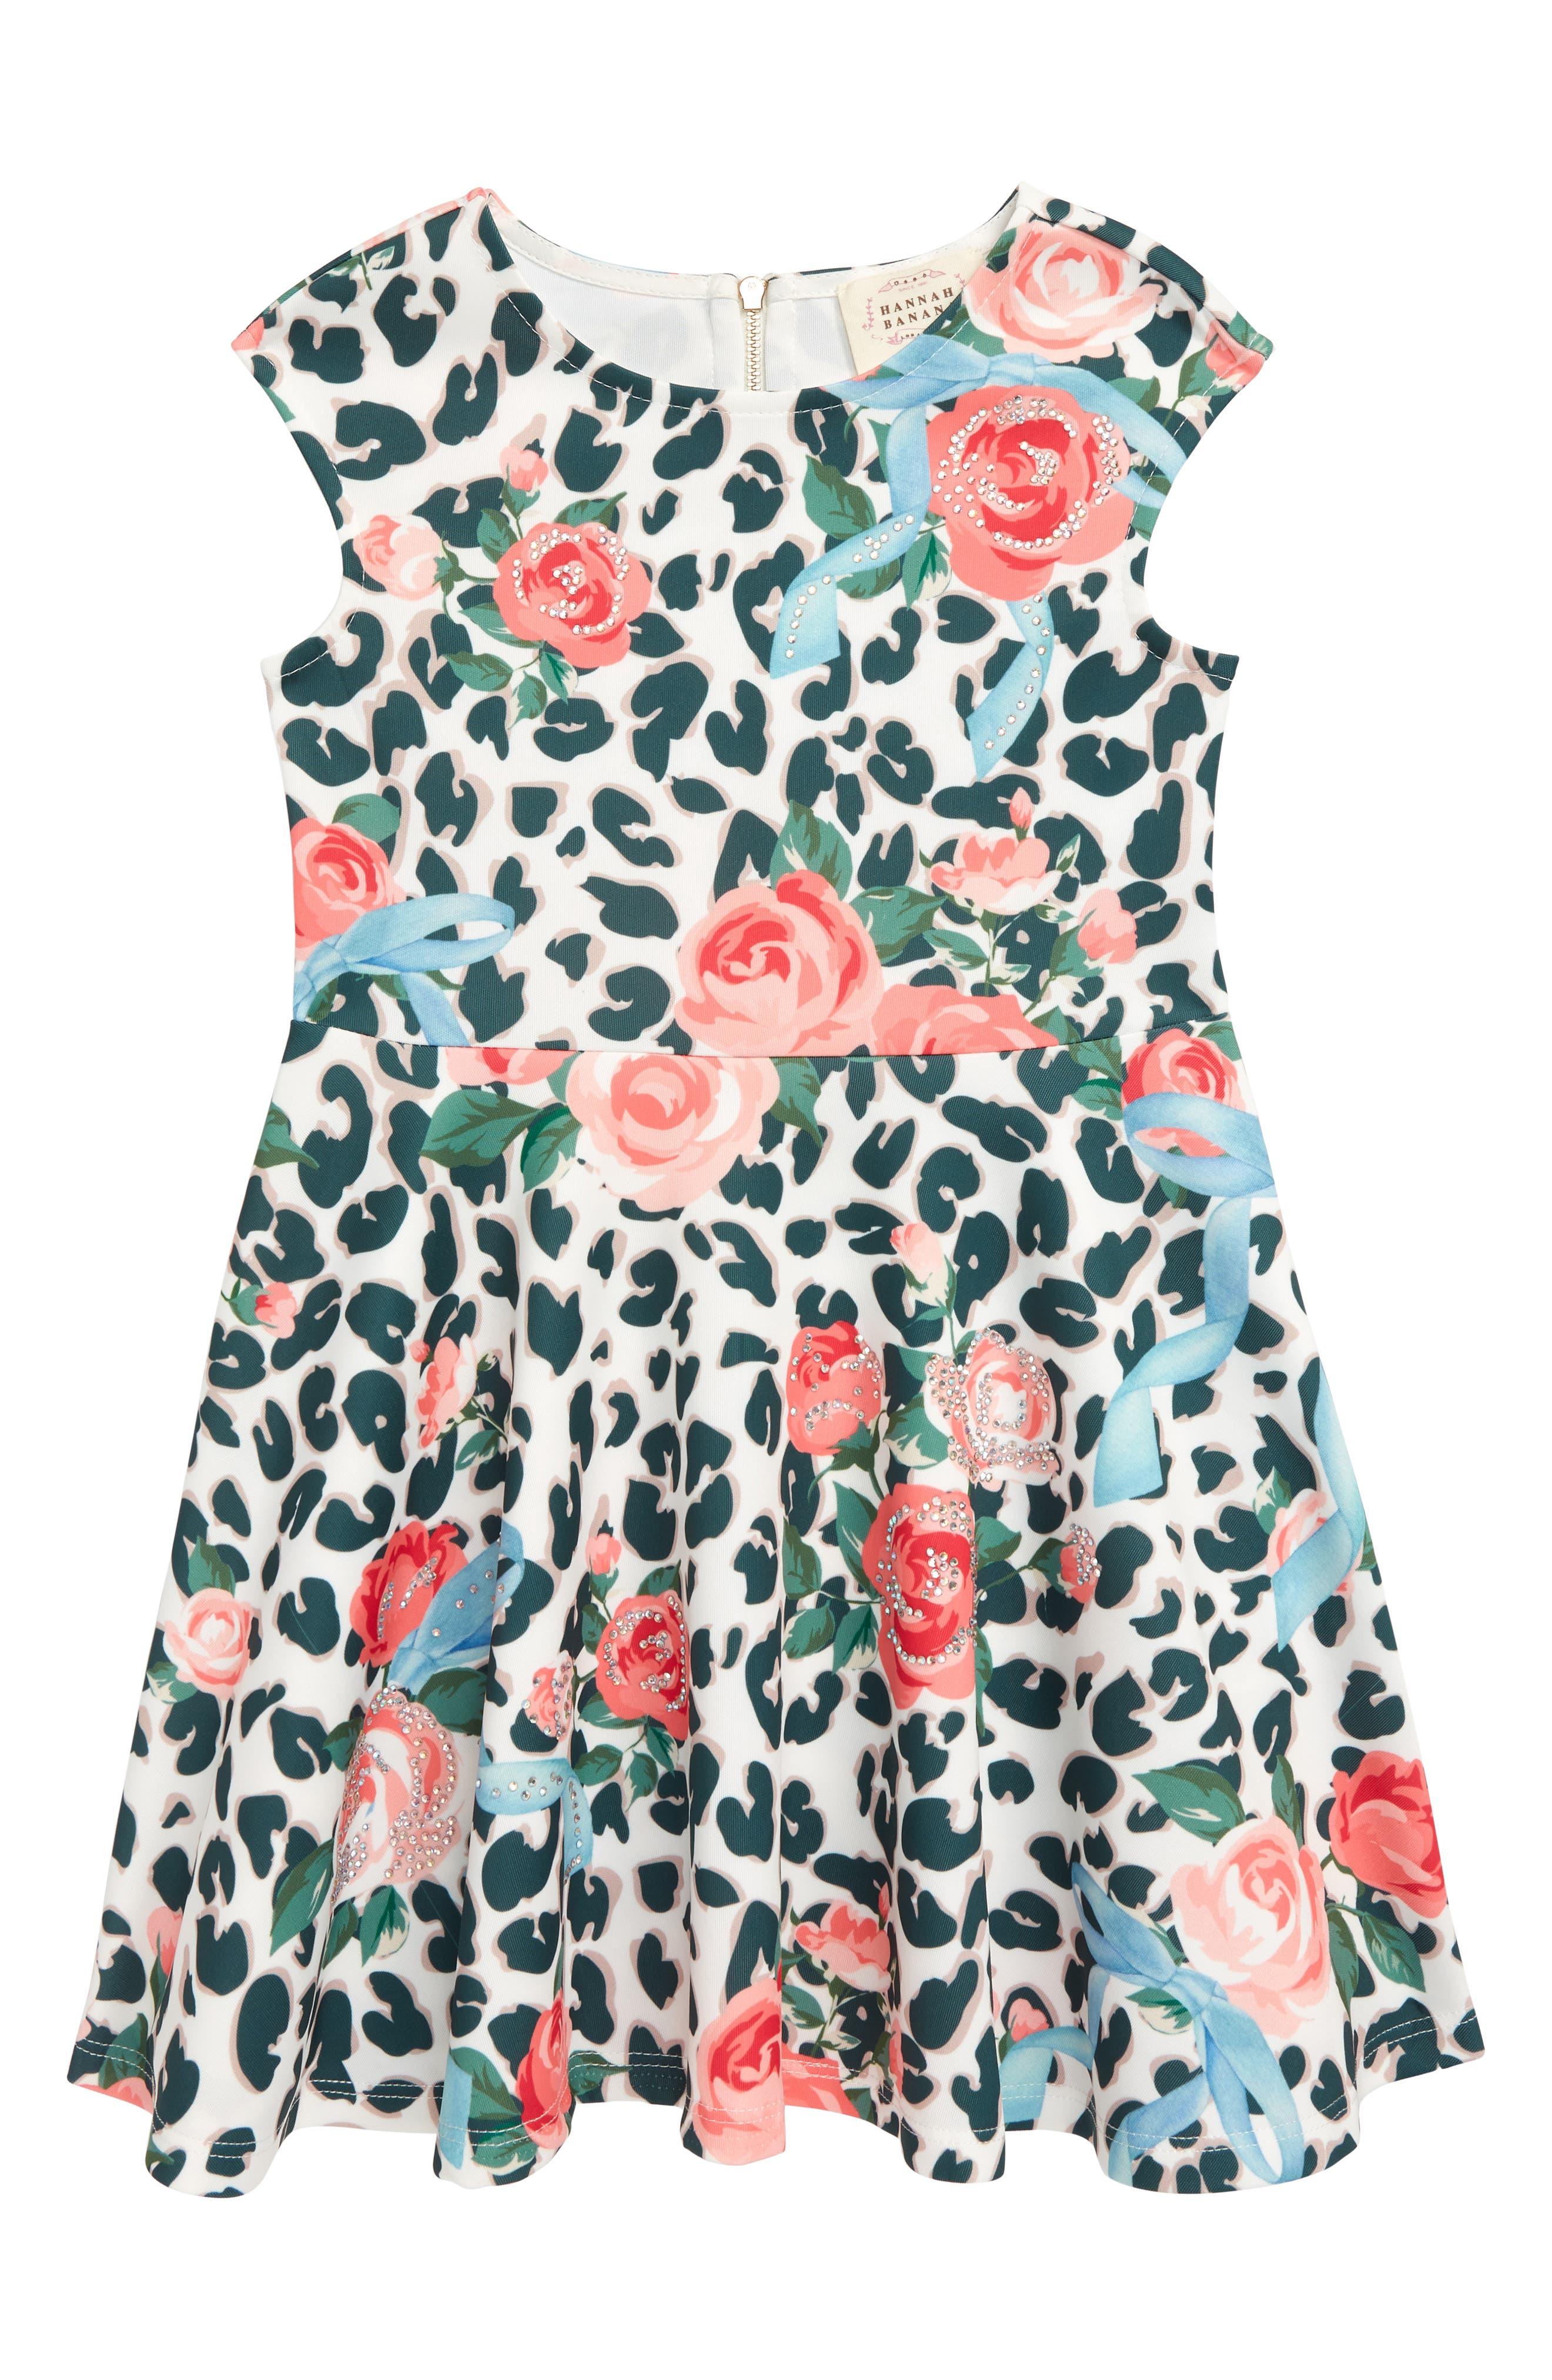 Girls Hannah Banana Leopard  Floral Scuba Fit  Flare Dress Size 6  White